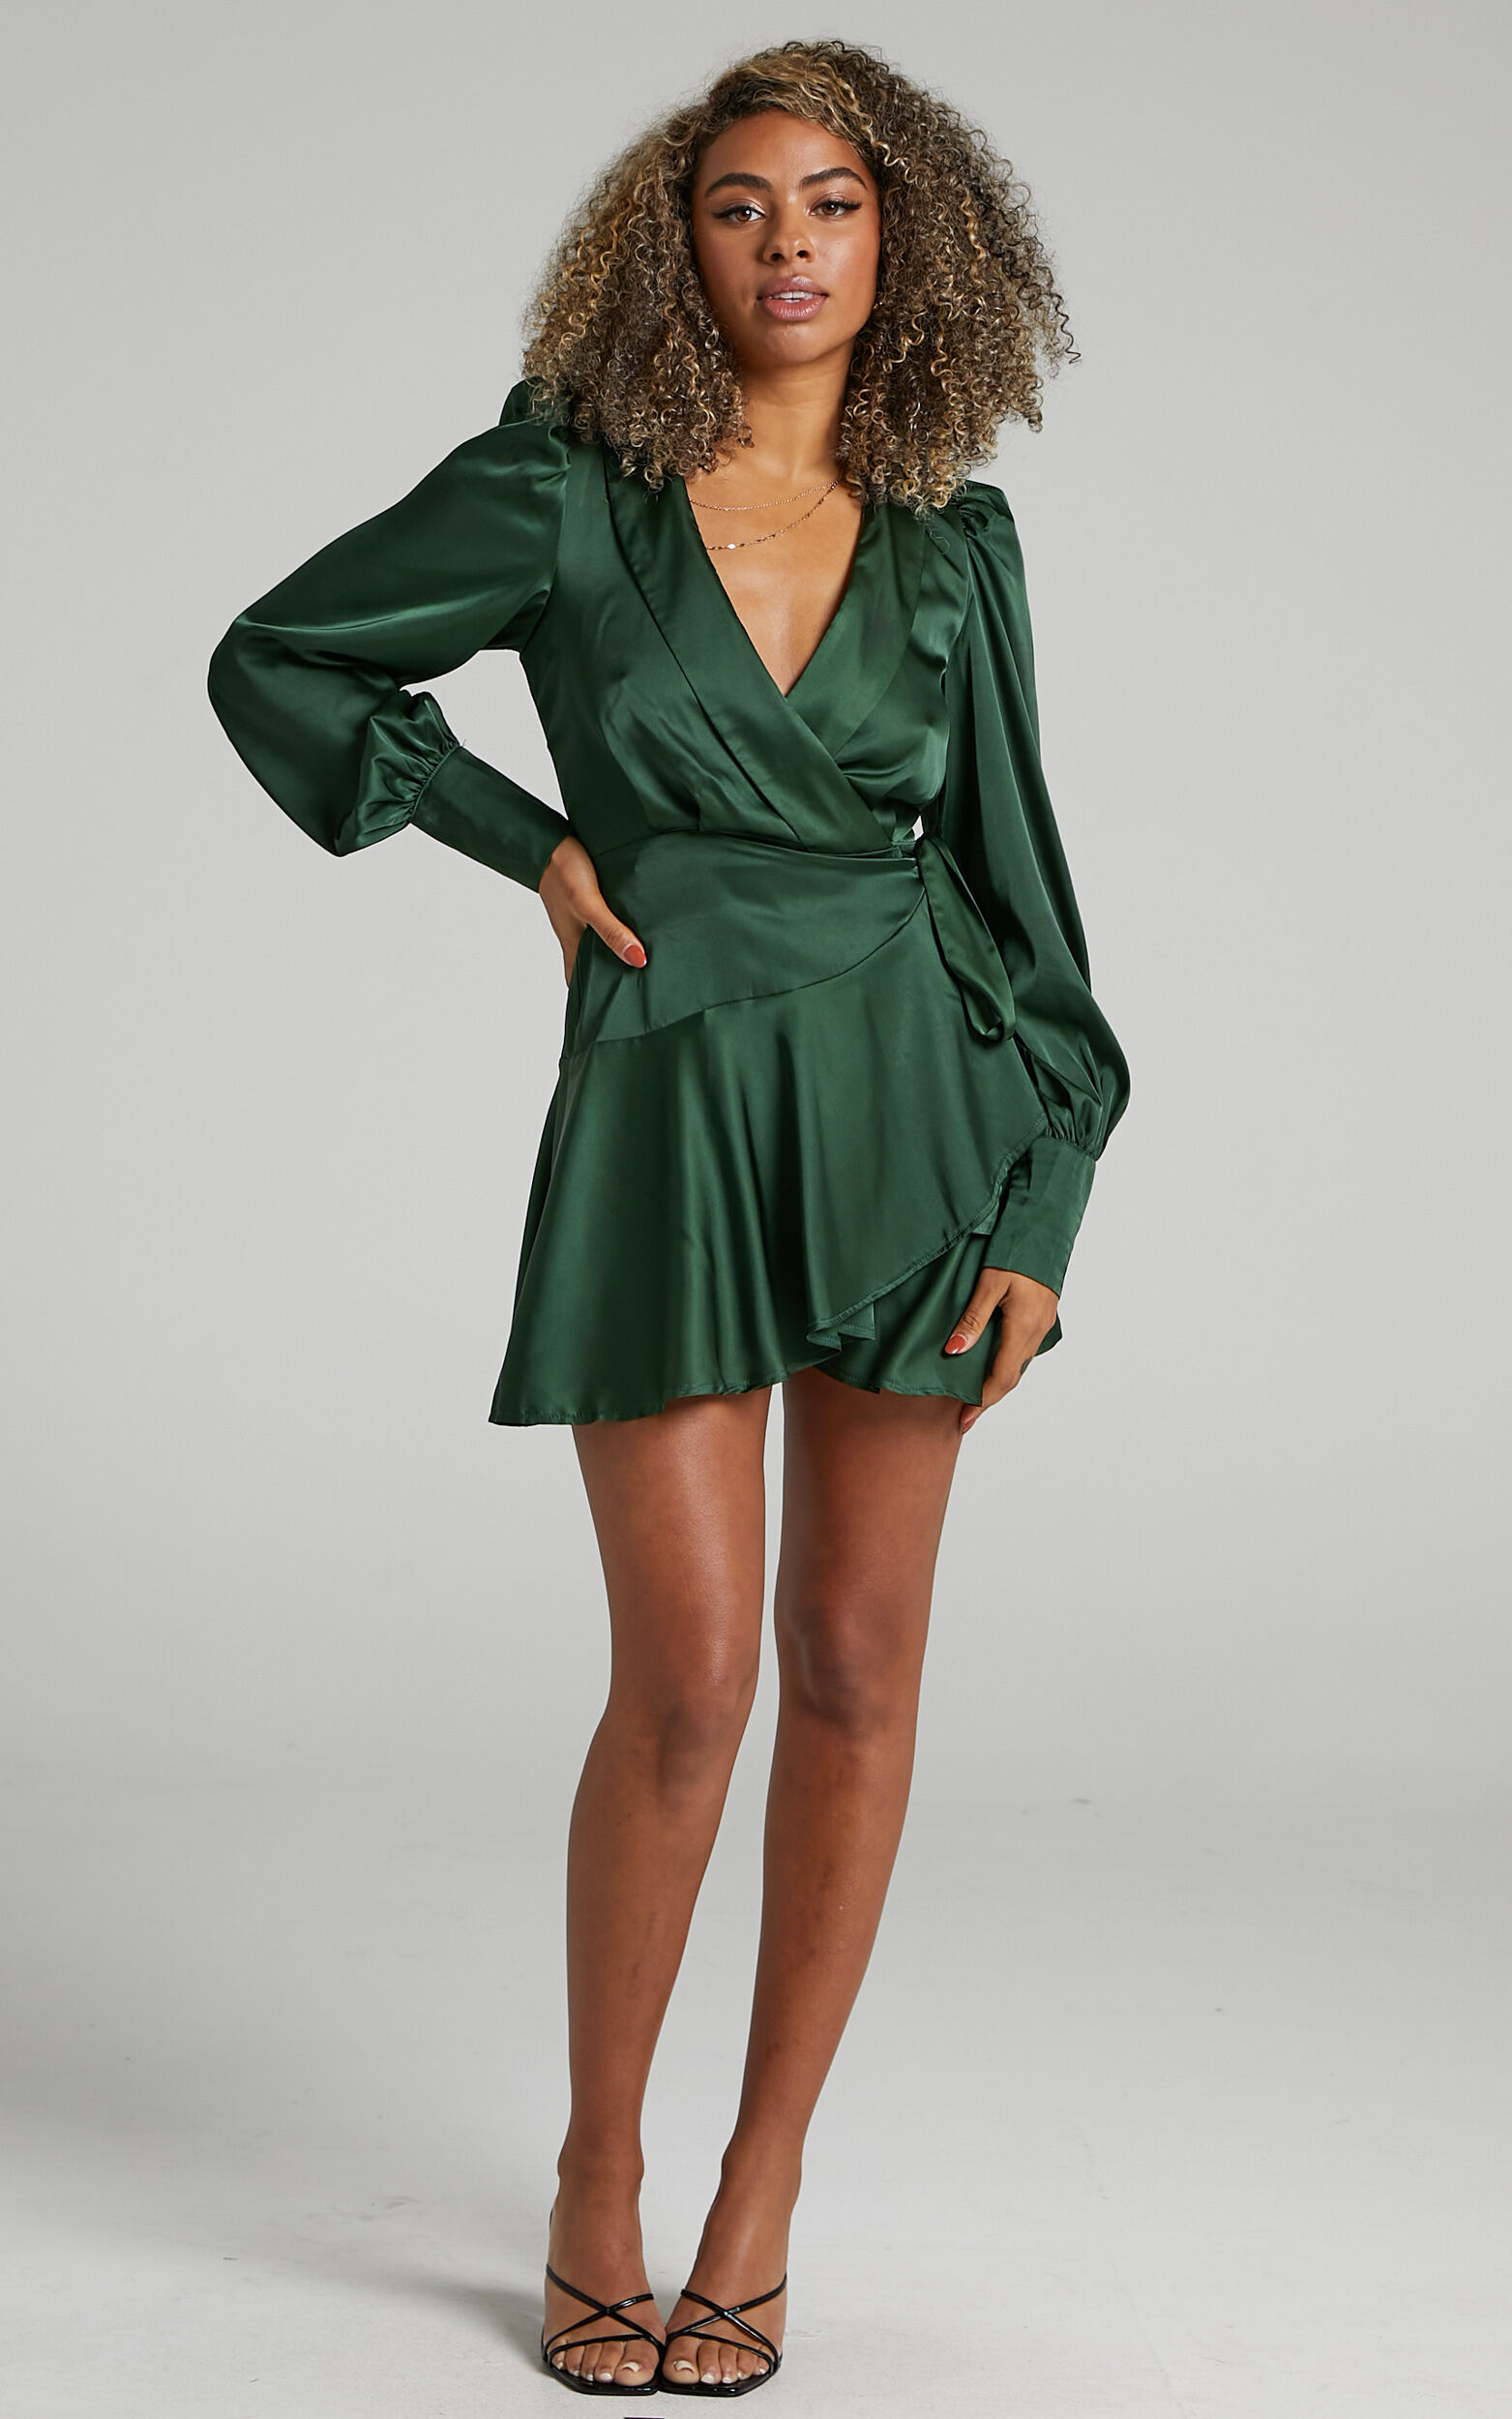 Breeana Wrap Mini Dress in Emerald - 04, GRN3, super-hi-res image number null